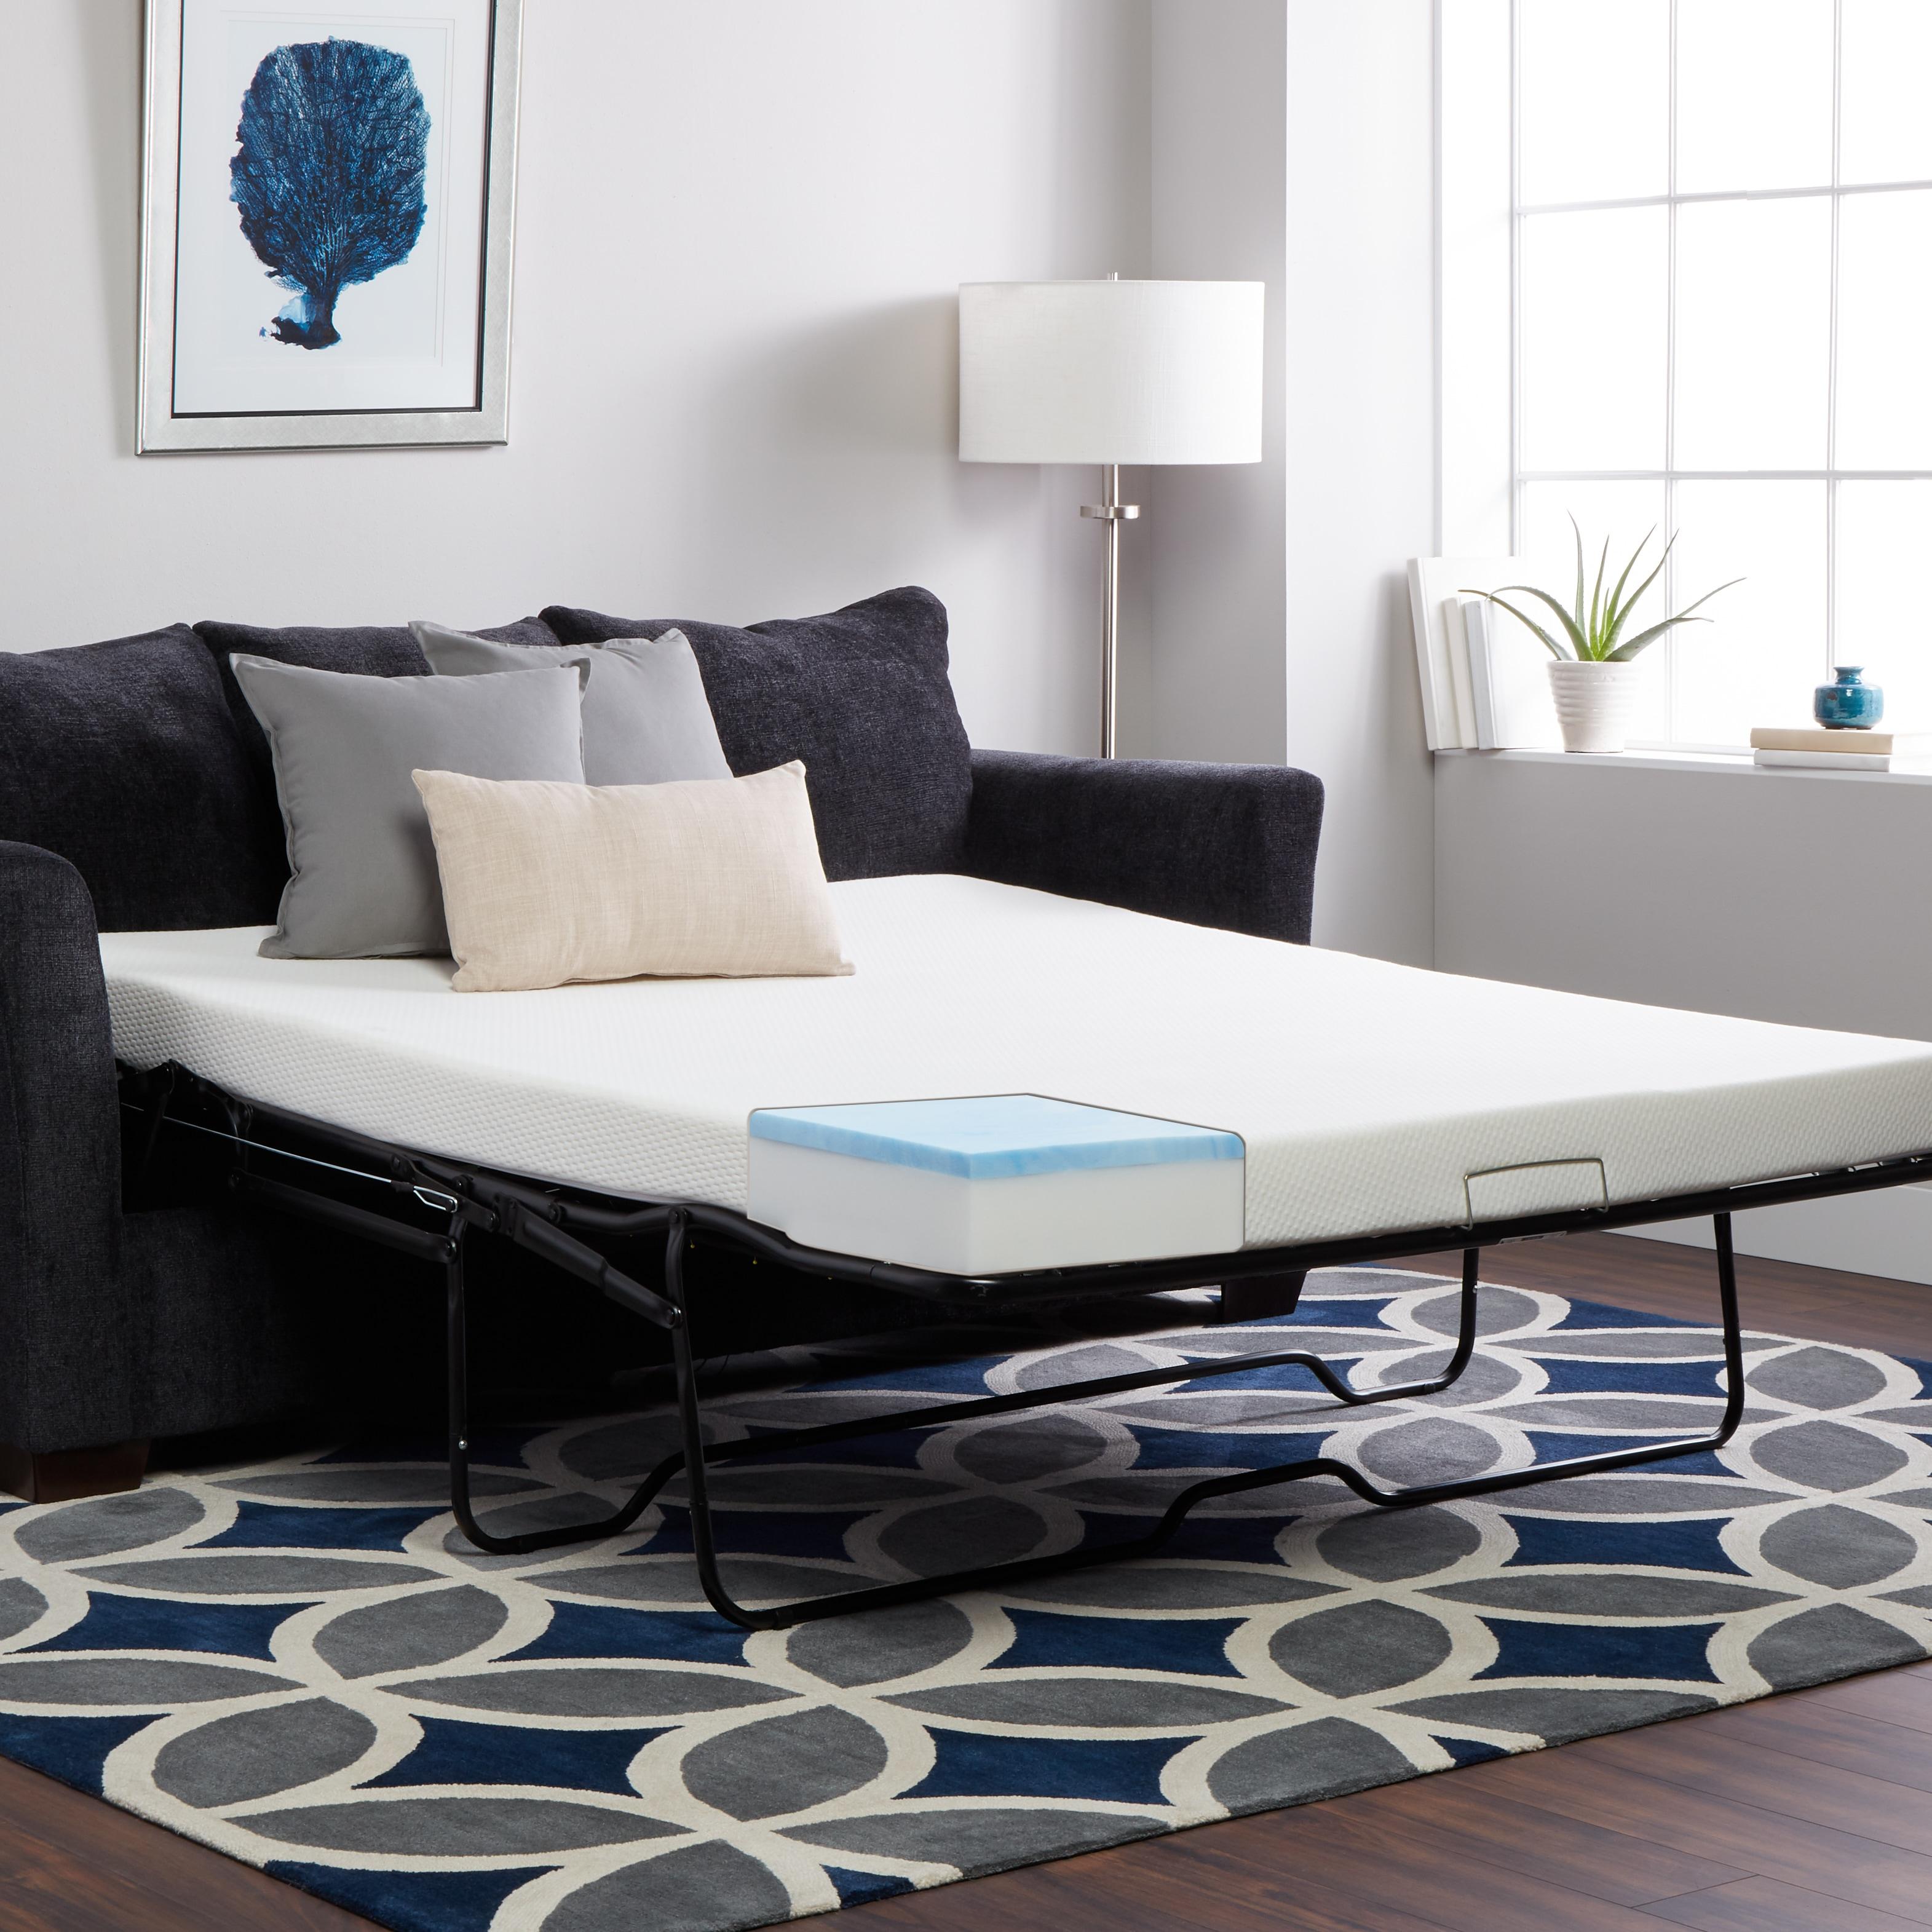 Select Luxury Twin-size Sleeper Sofa Replacement Gel Memo...